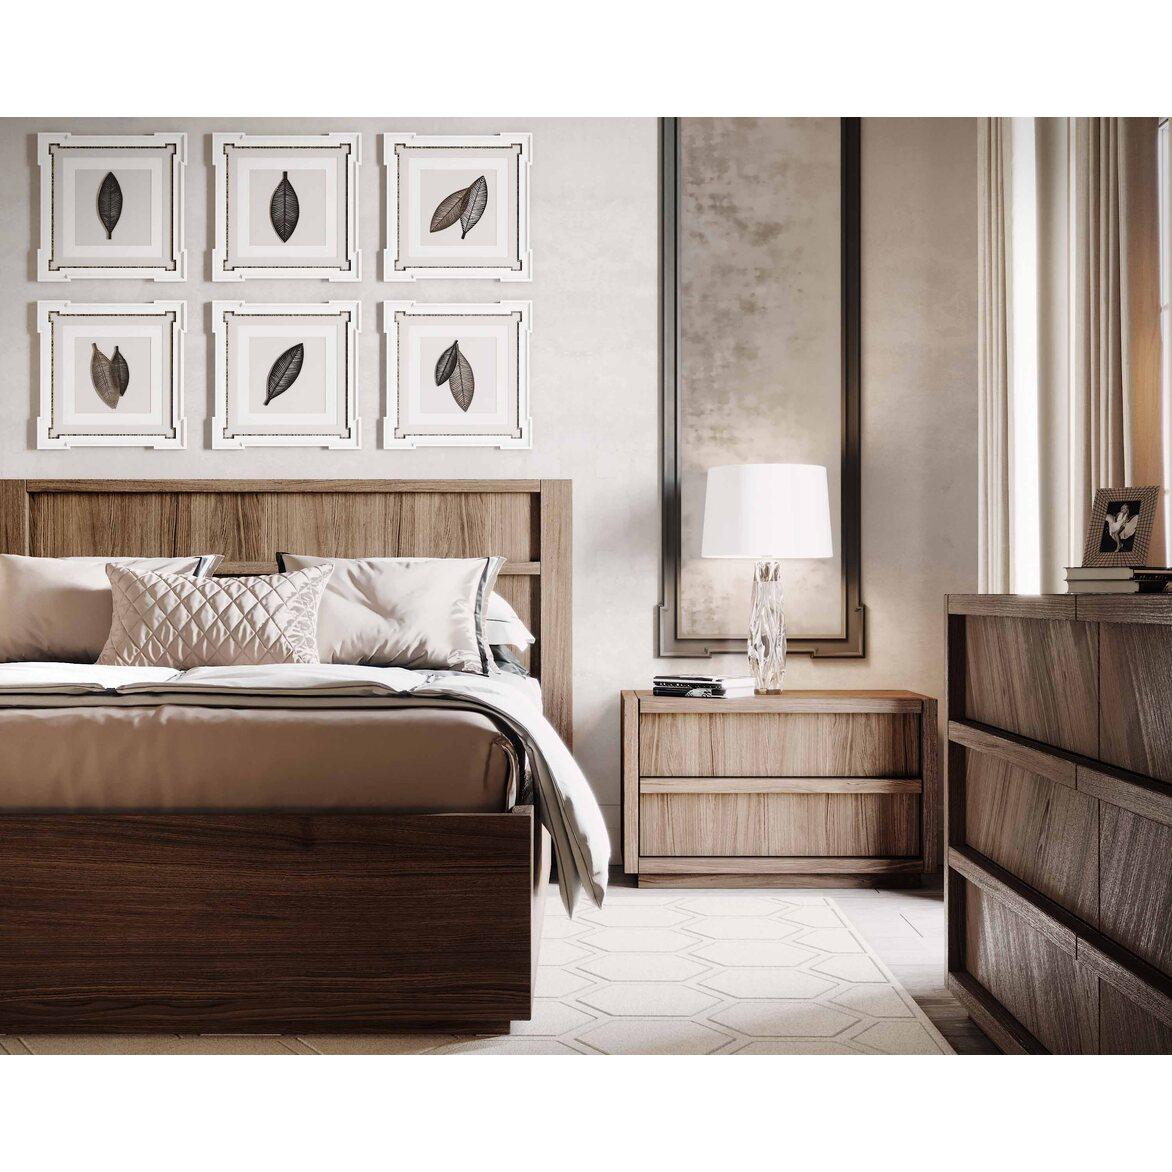 "Кровать 160*200 ""Brenson"" 5 | Двуспальные кровати Kingsby"